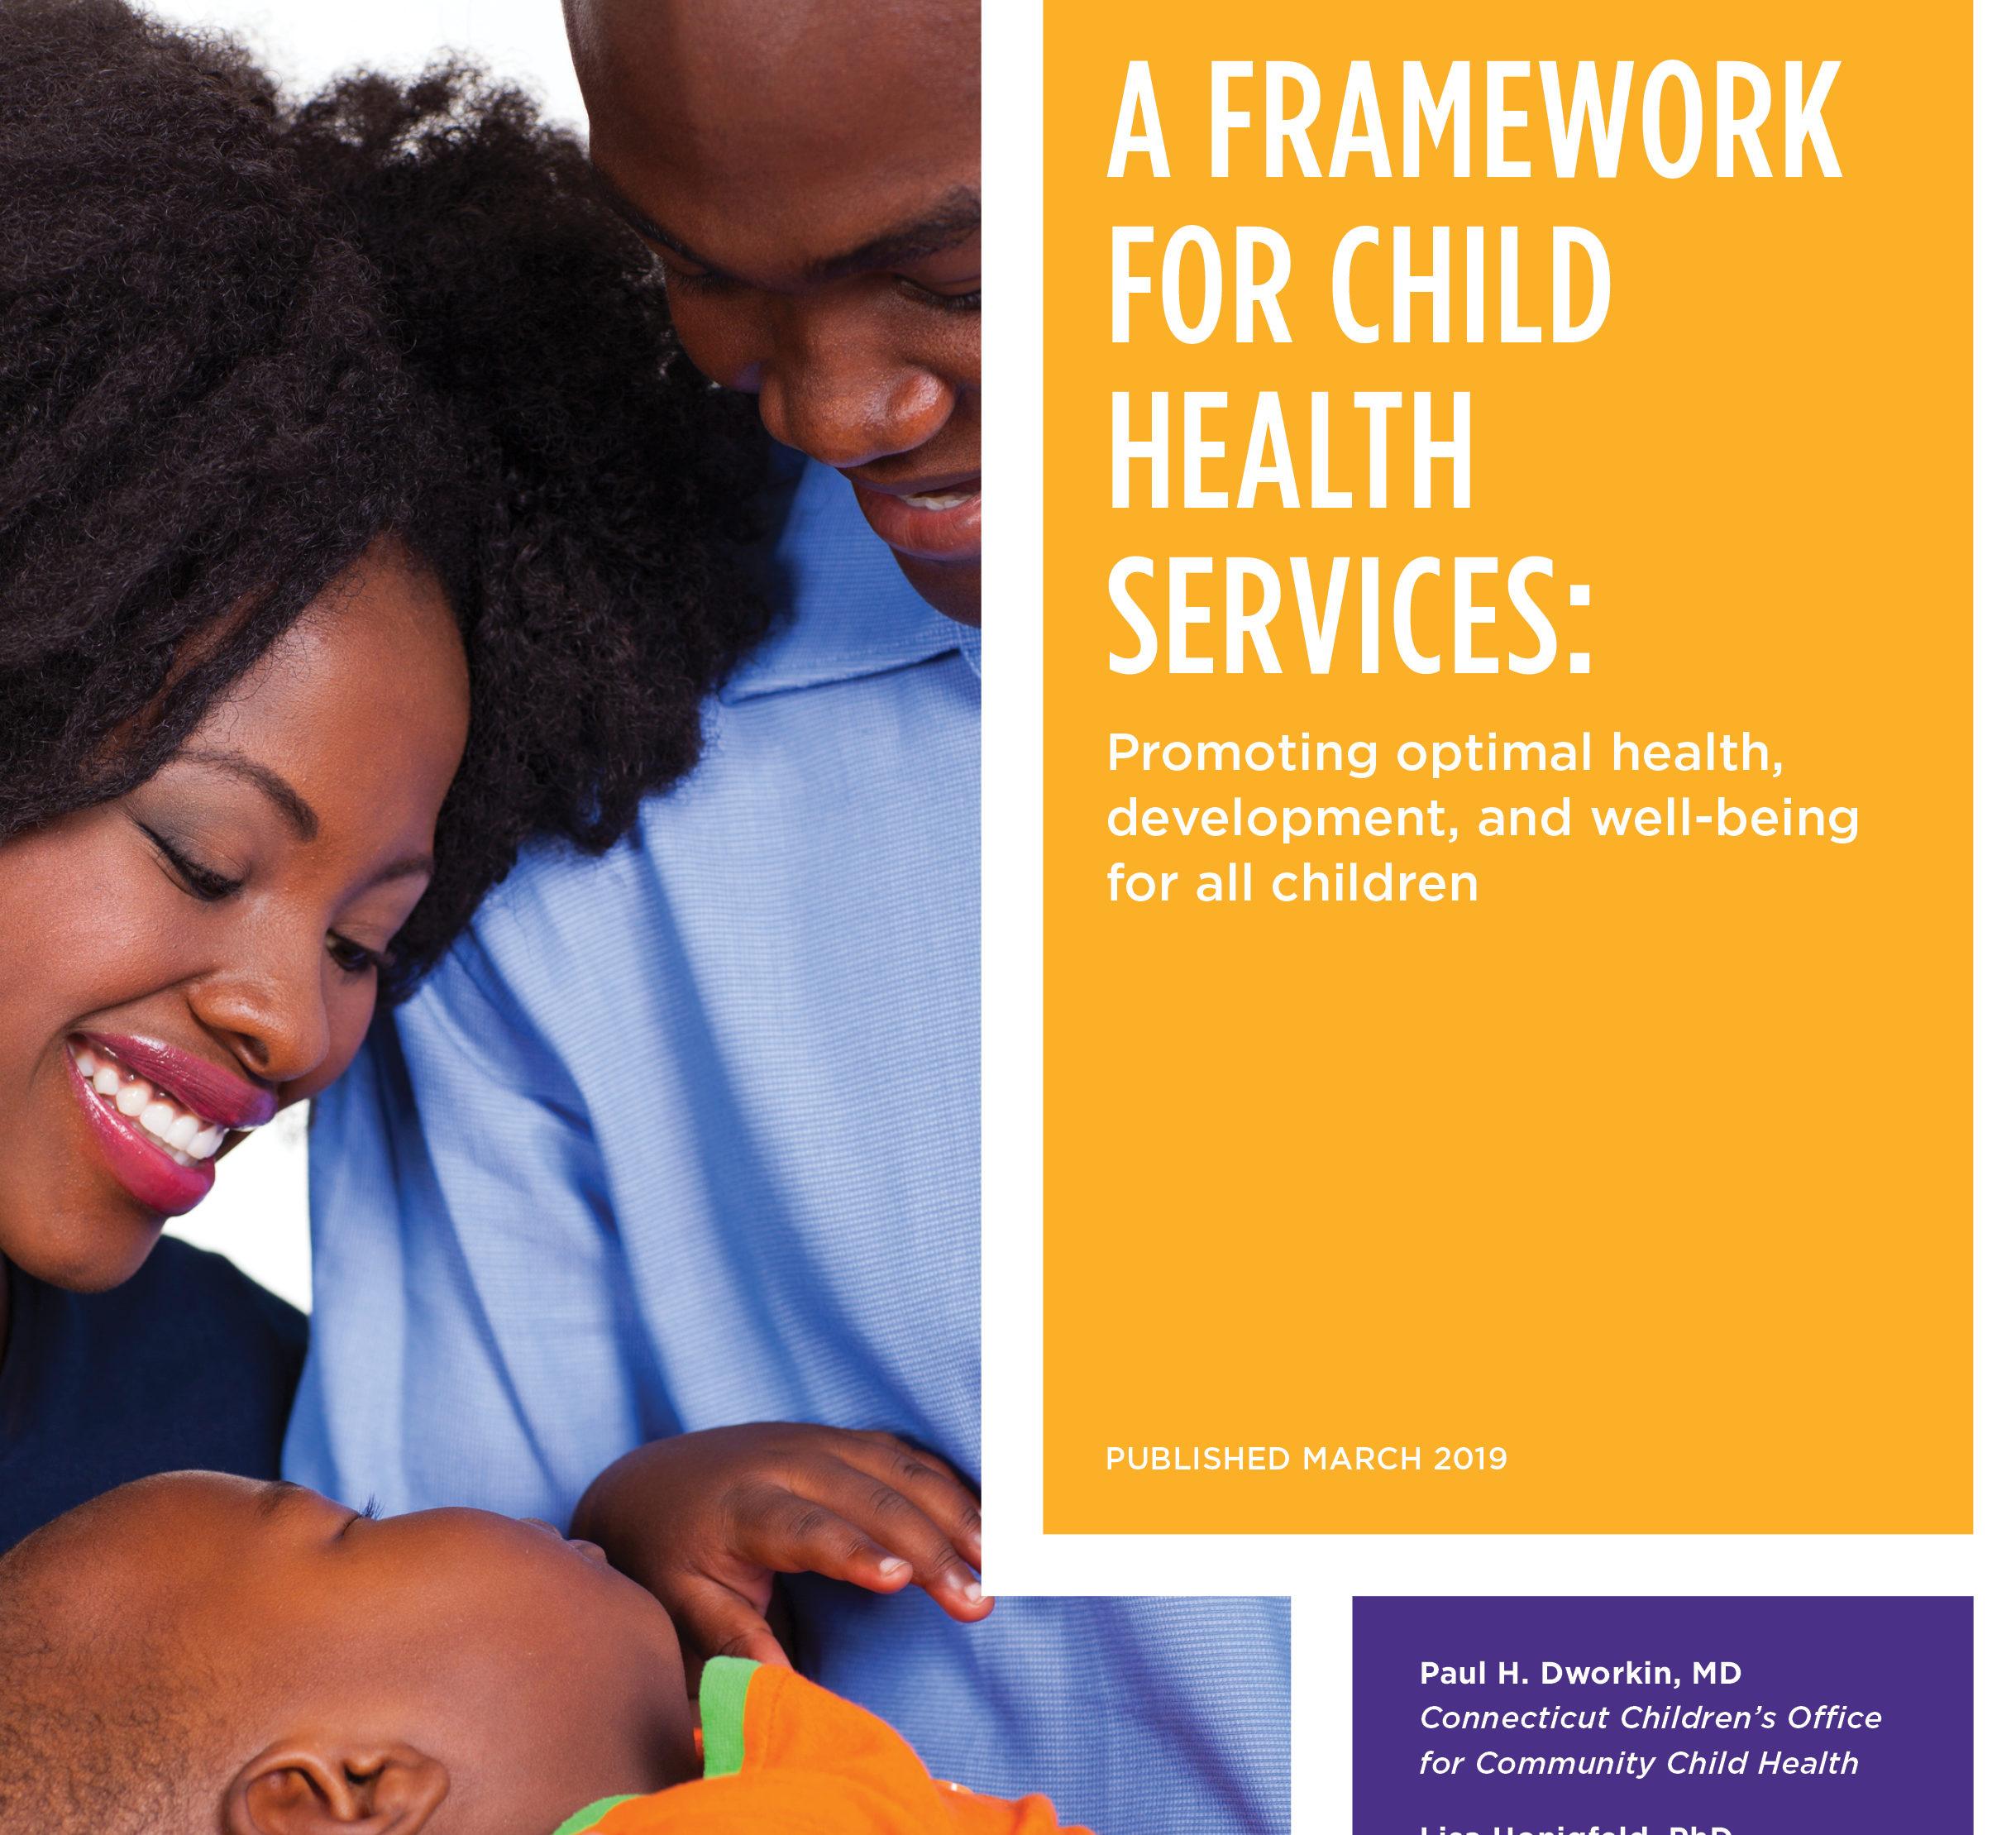 Connecticut can assure a better future for all children